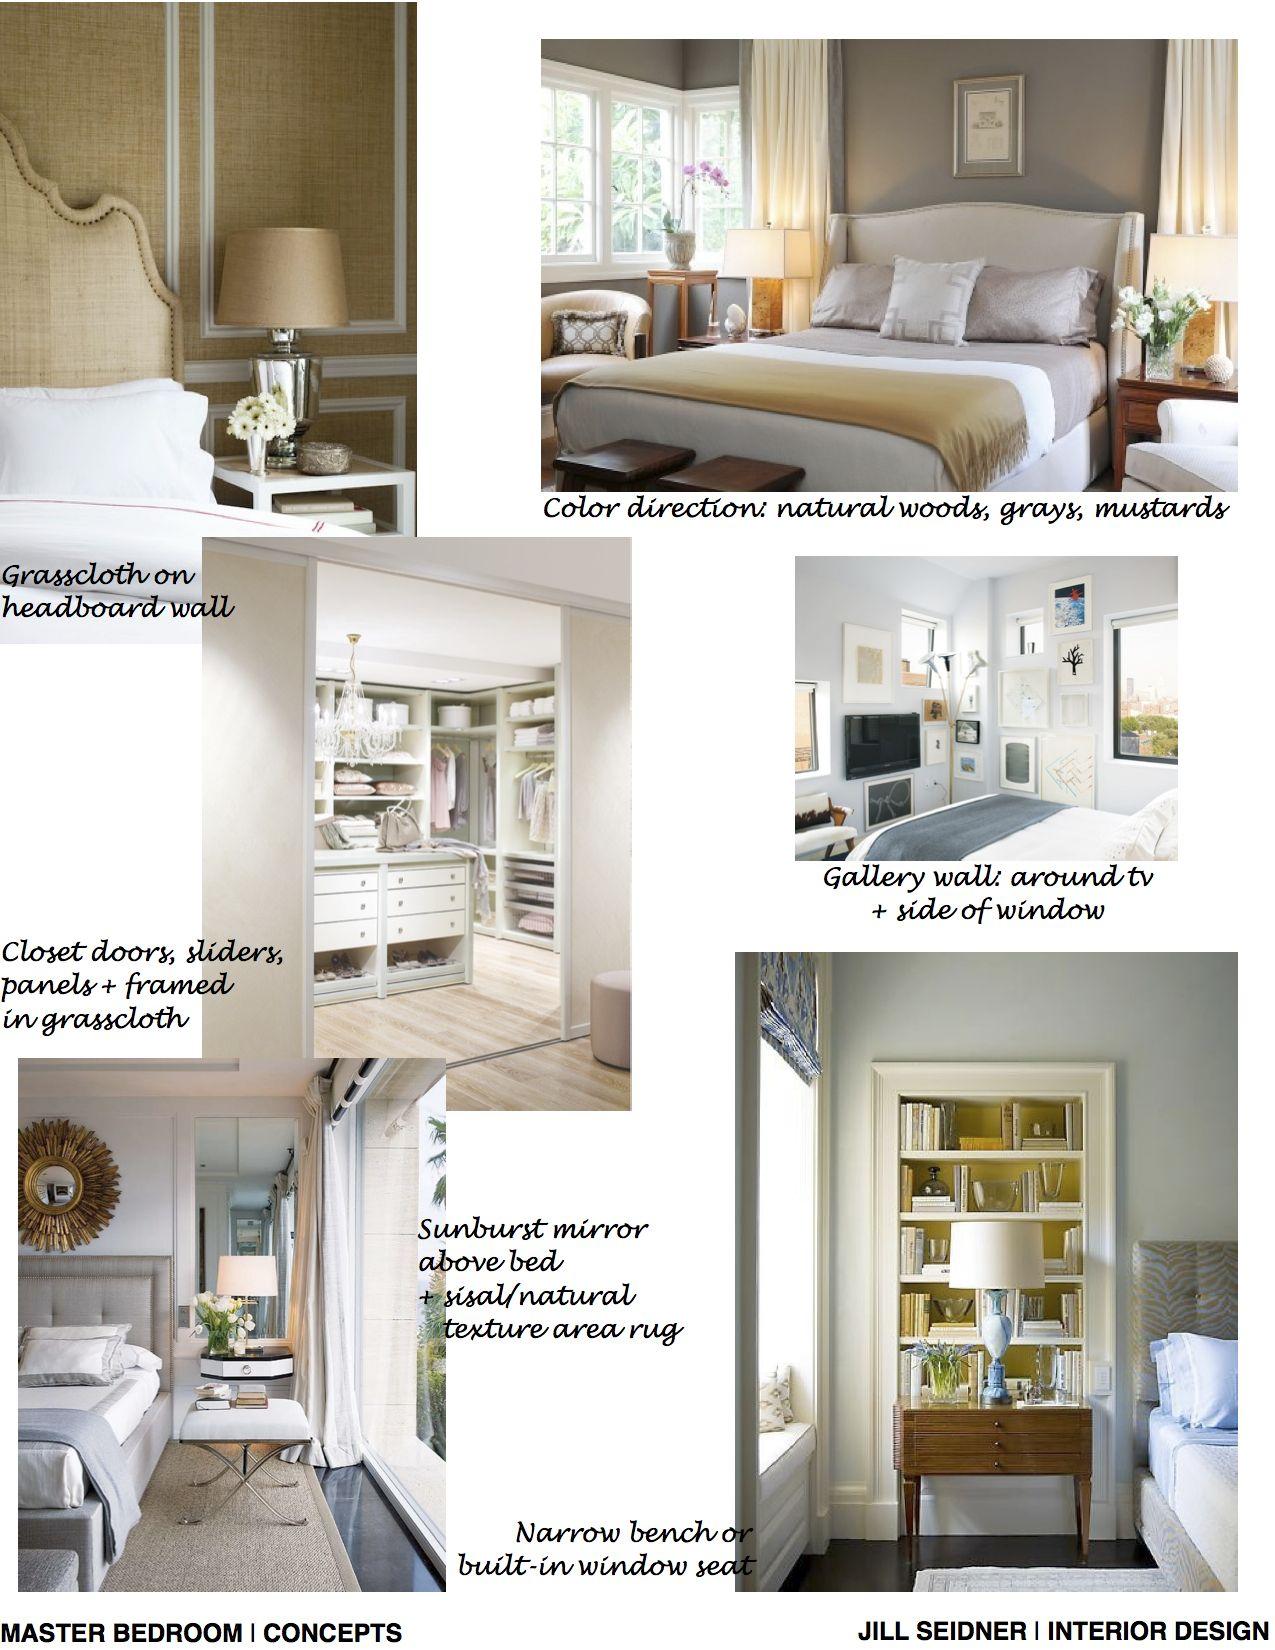 Above window decor  long beach ca residence master bedroom ideas concept board